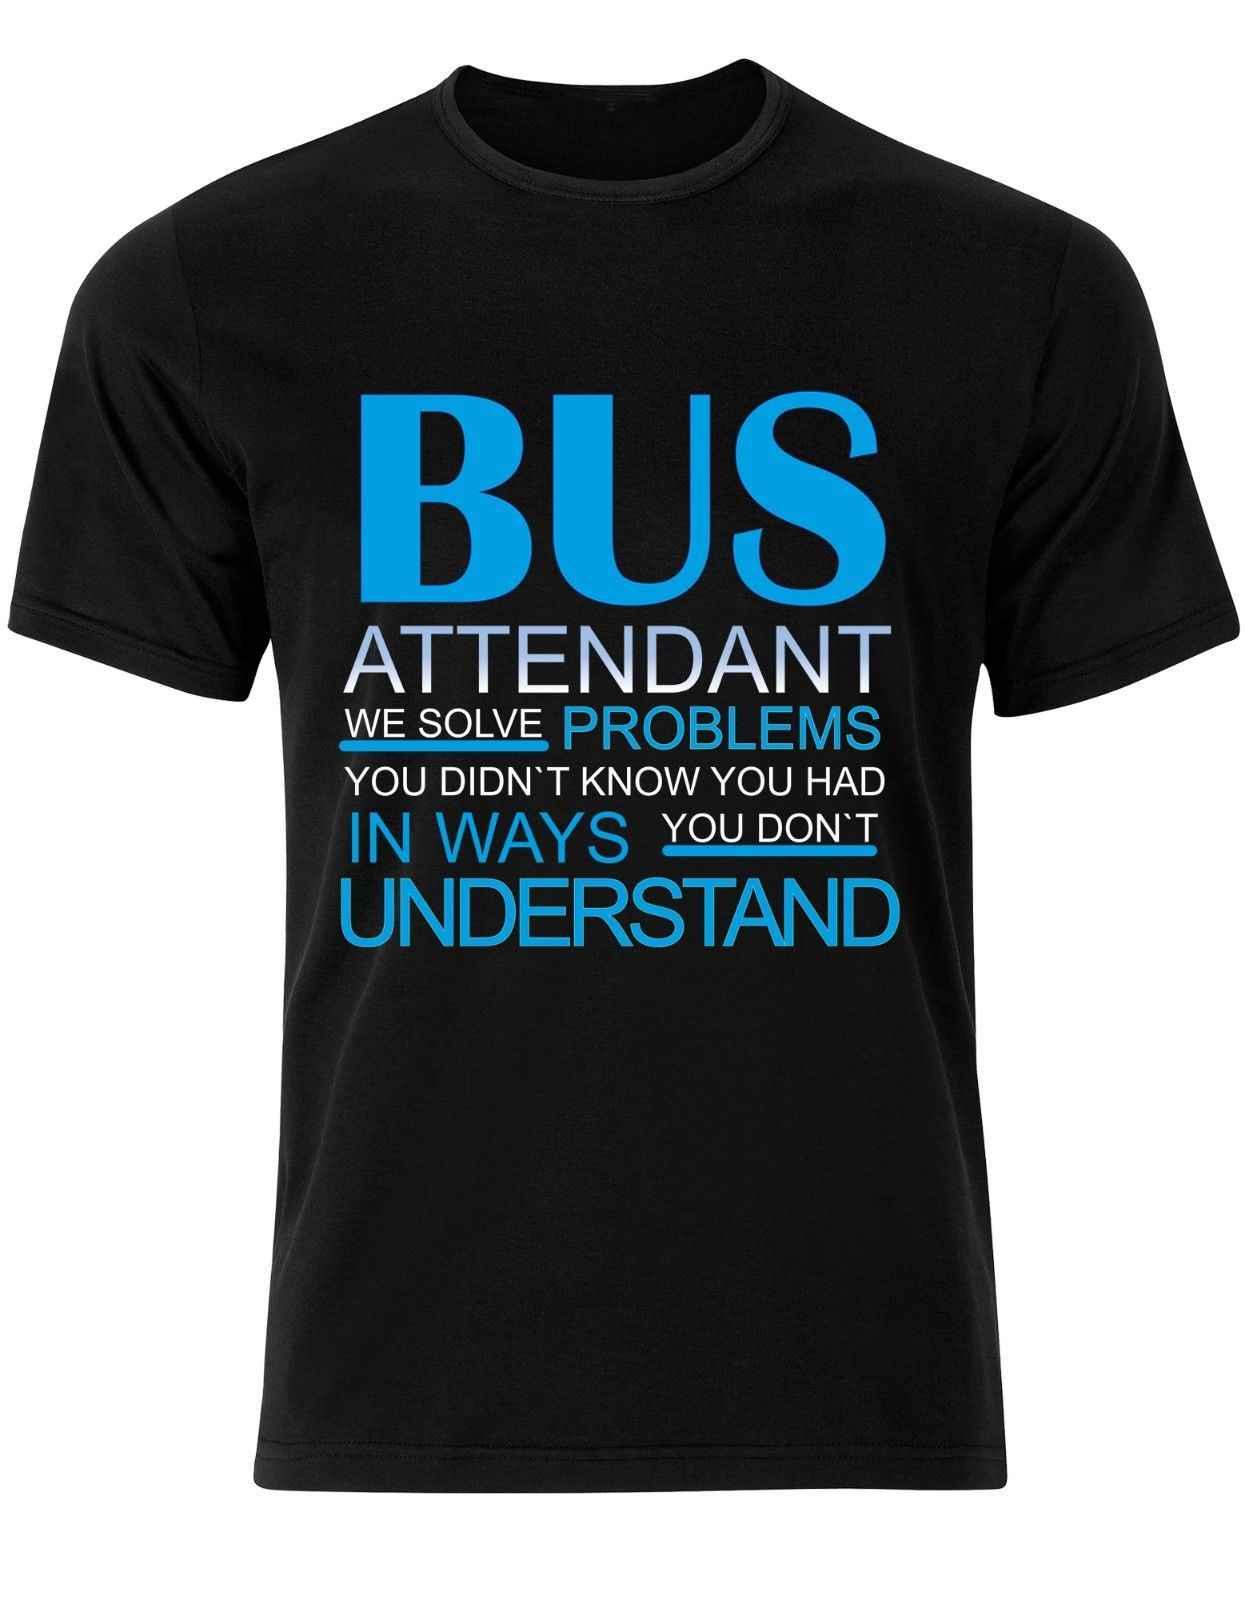 Gildan Bus Attendant рабочие проблемы Цитата Мужская футболка Топ AJ73